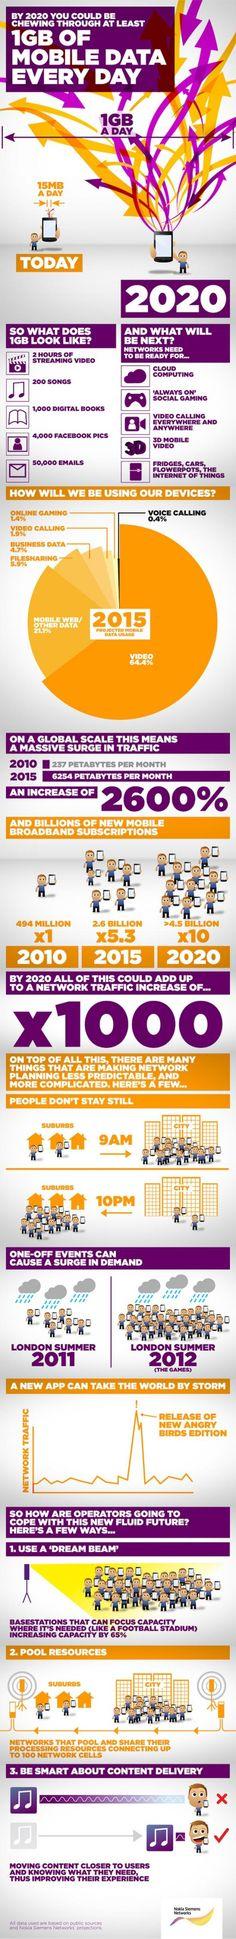 #infografia #internet #móvil #smartphone